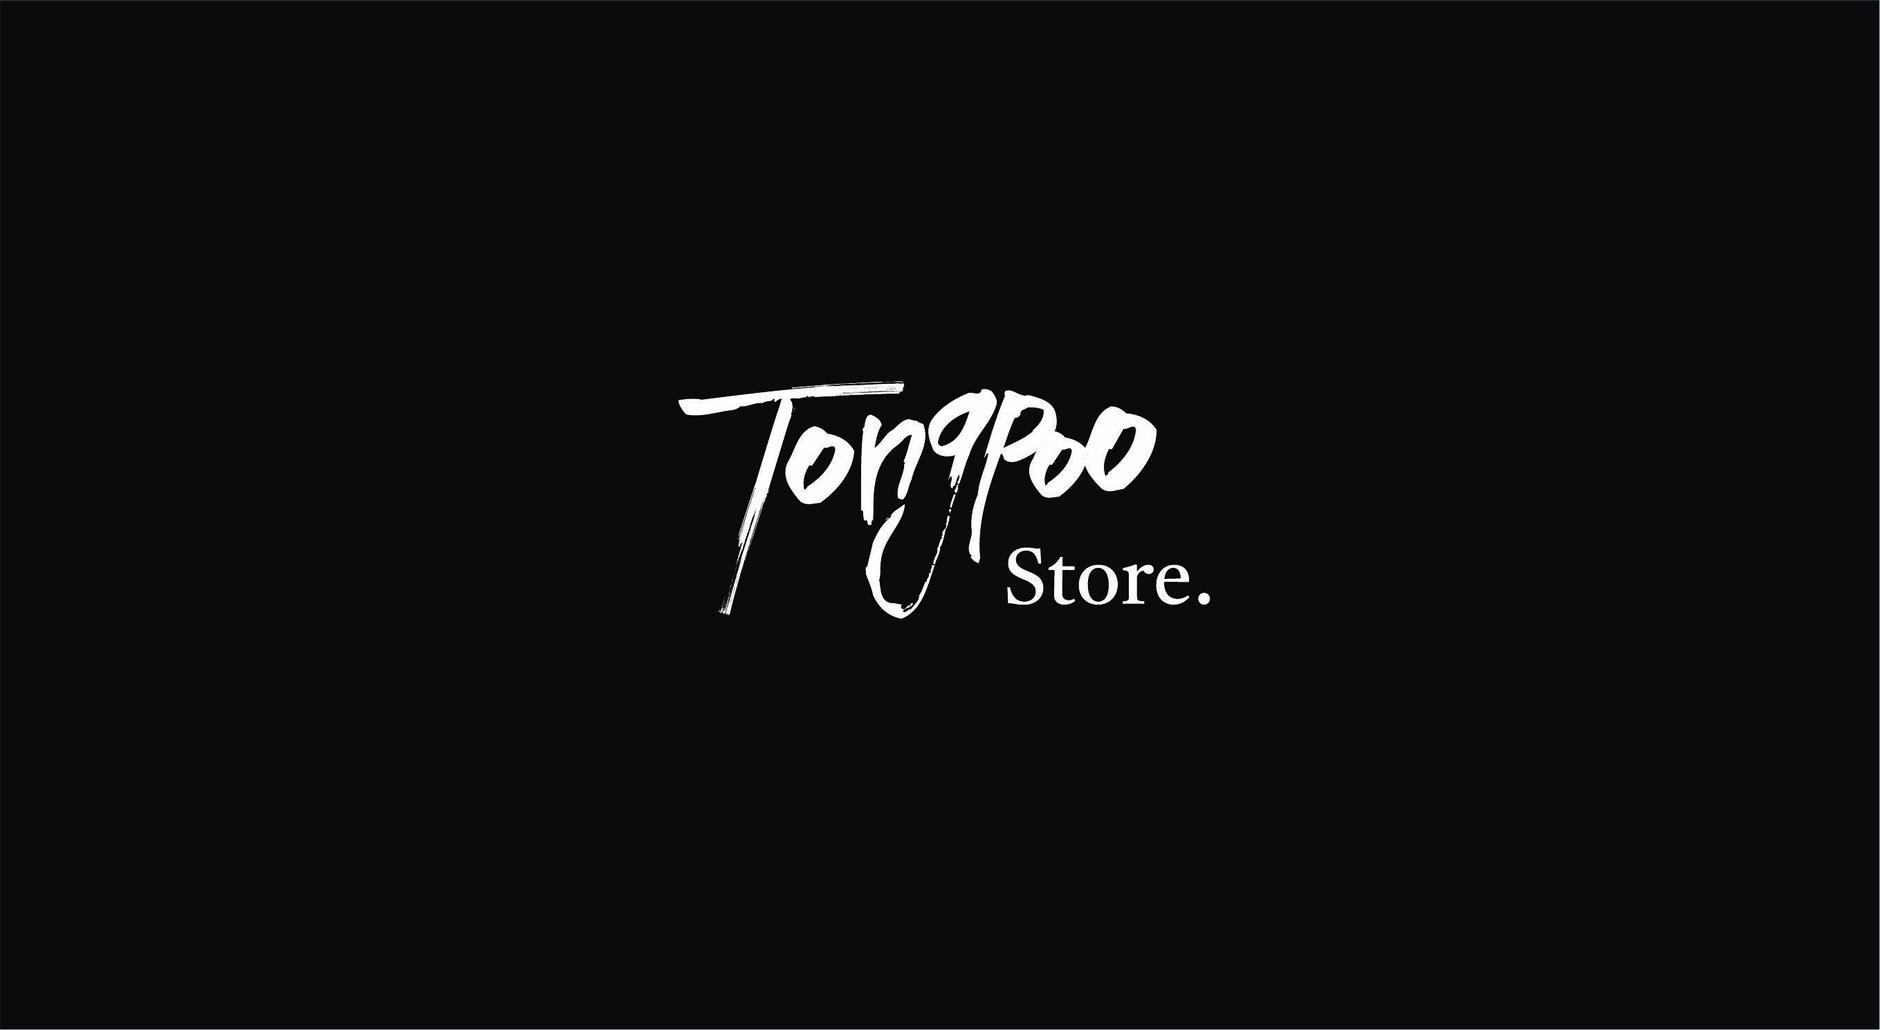 Tongpoo store.